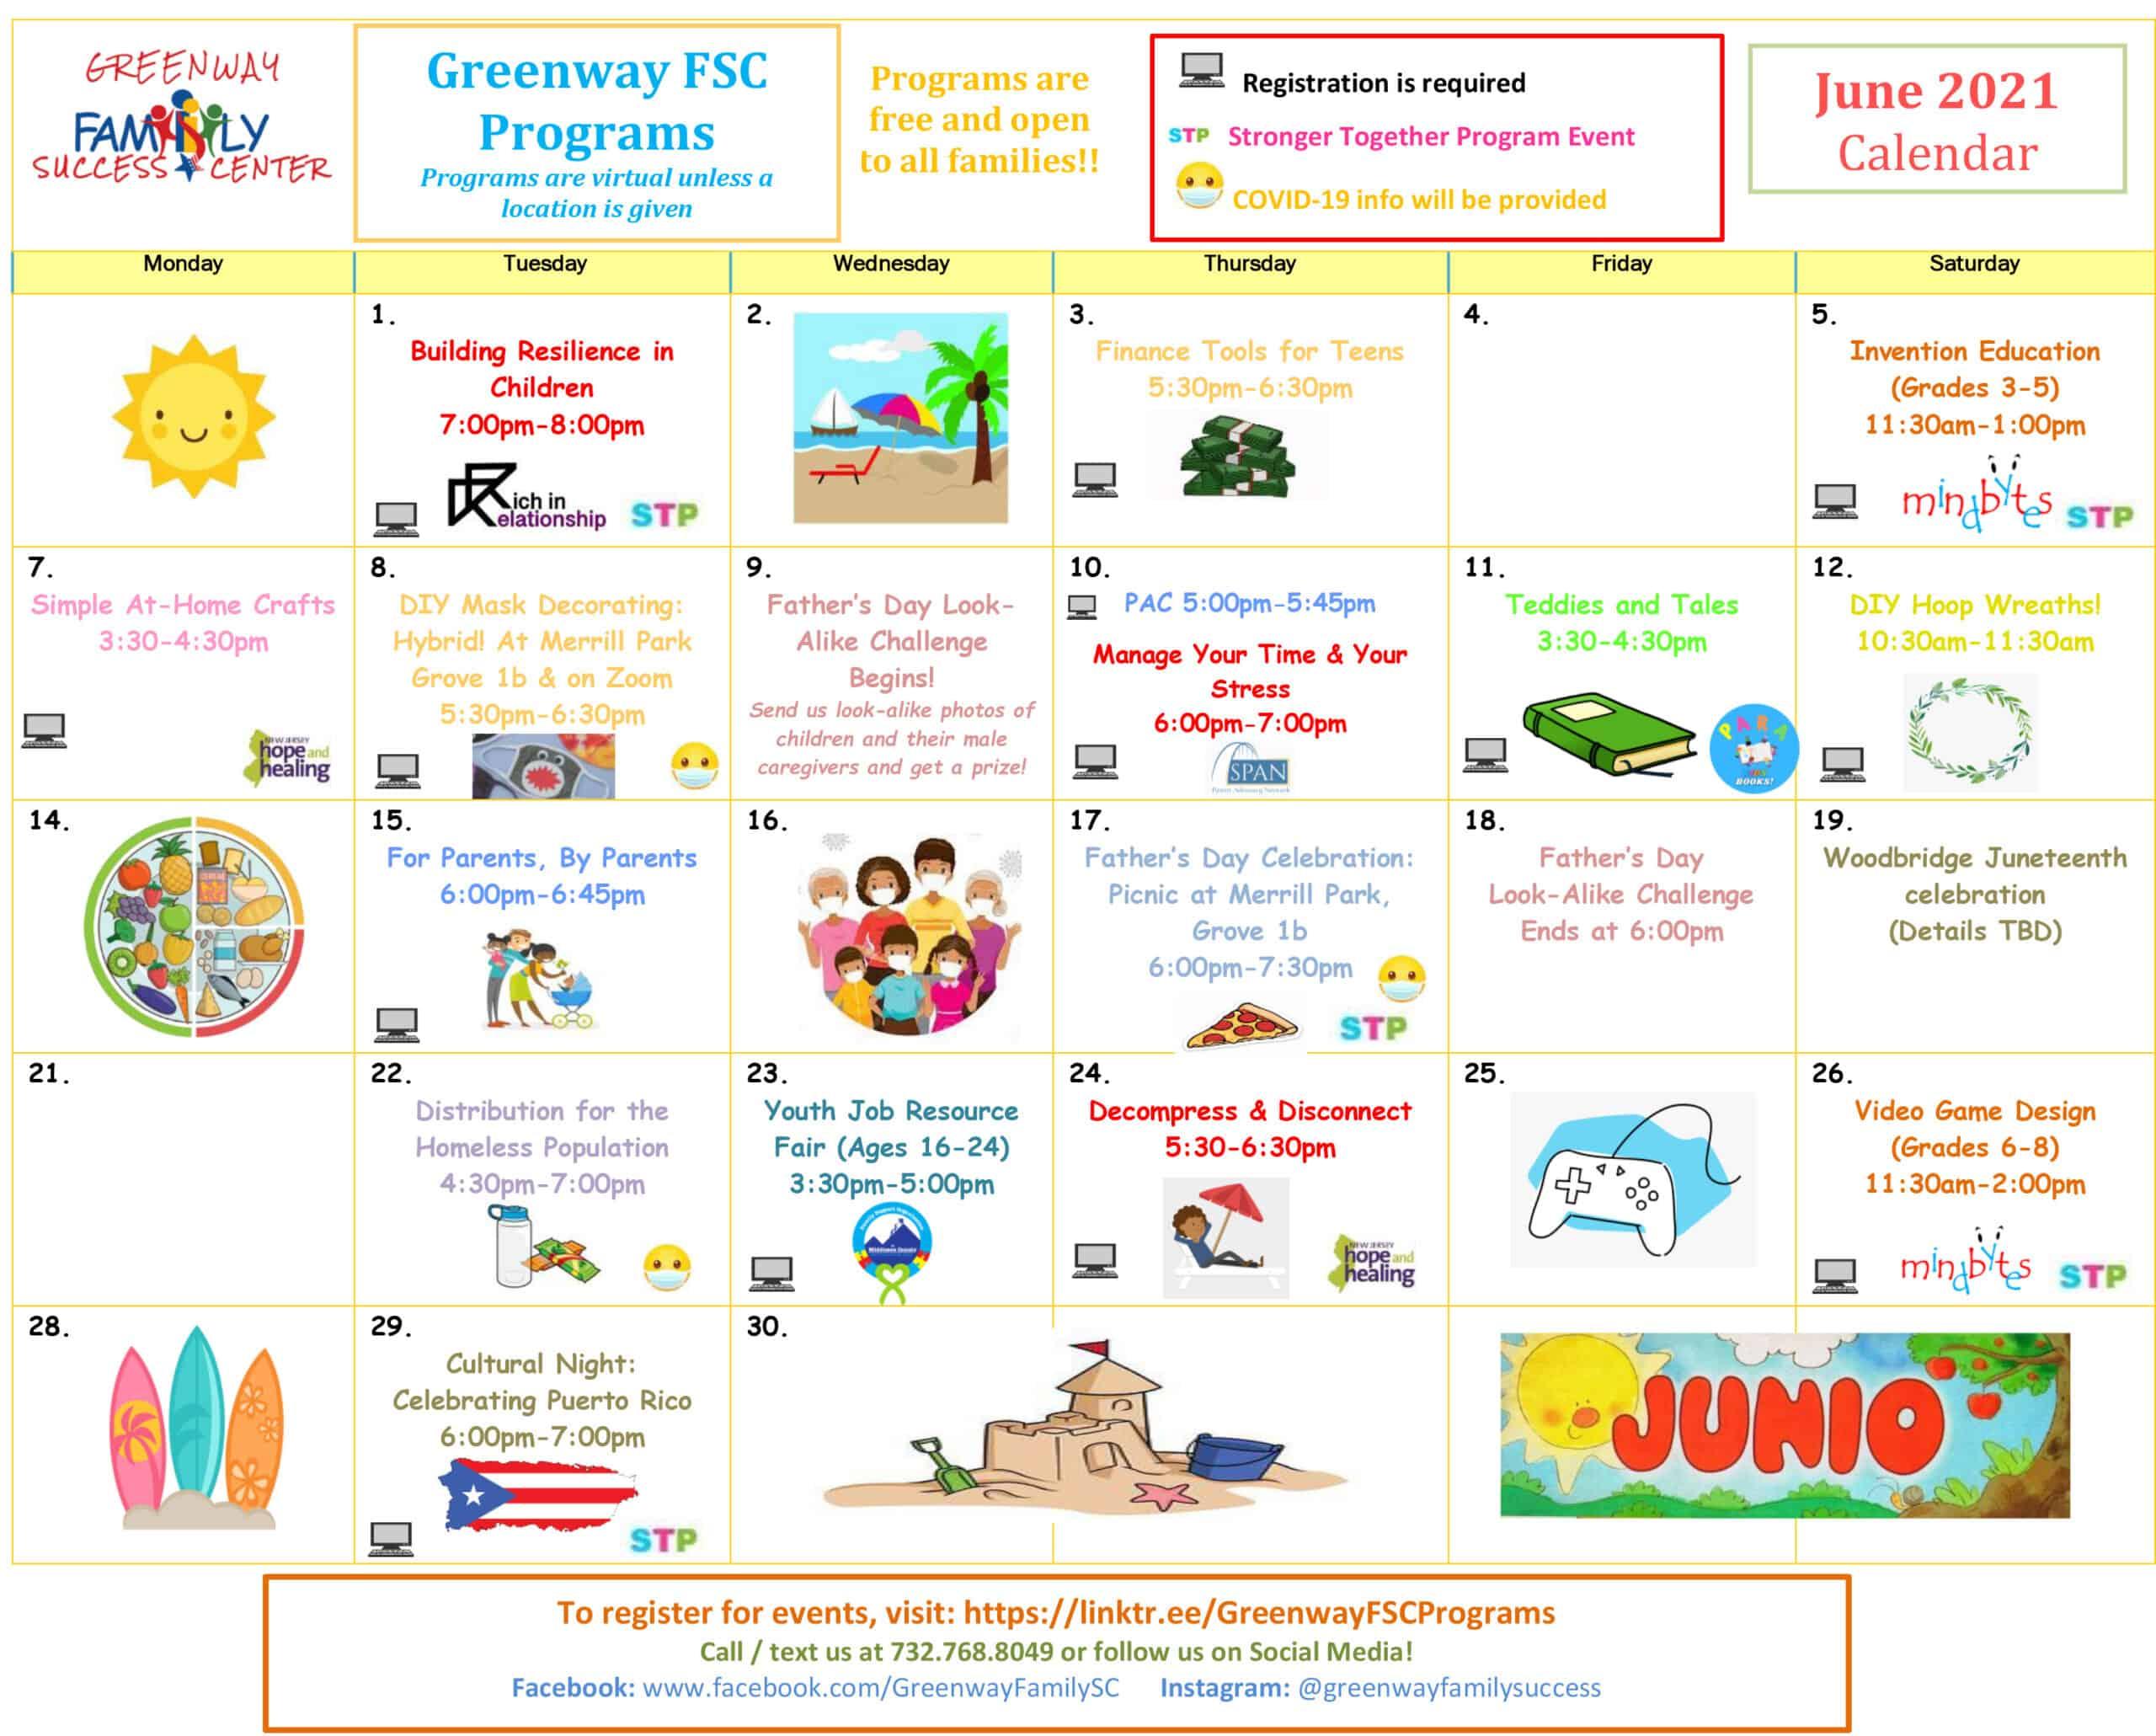 Greenway FSC June 2021 Calendar